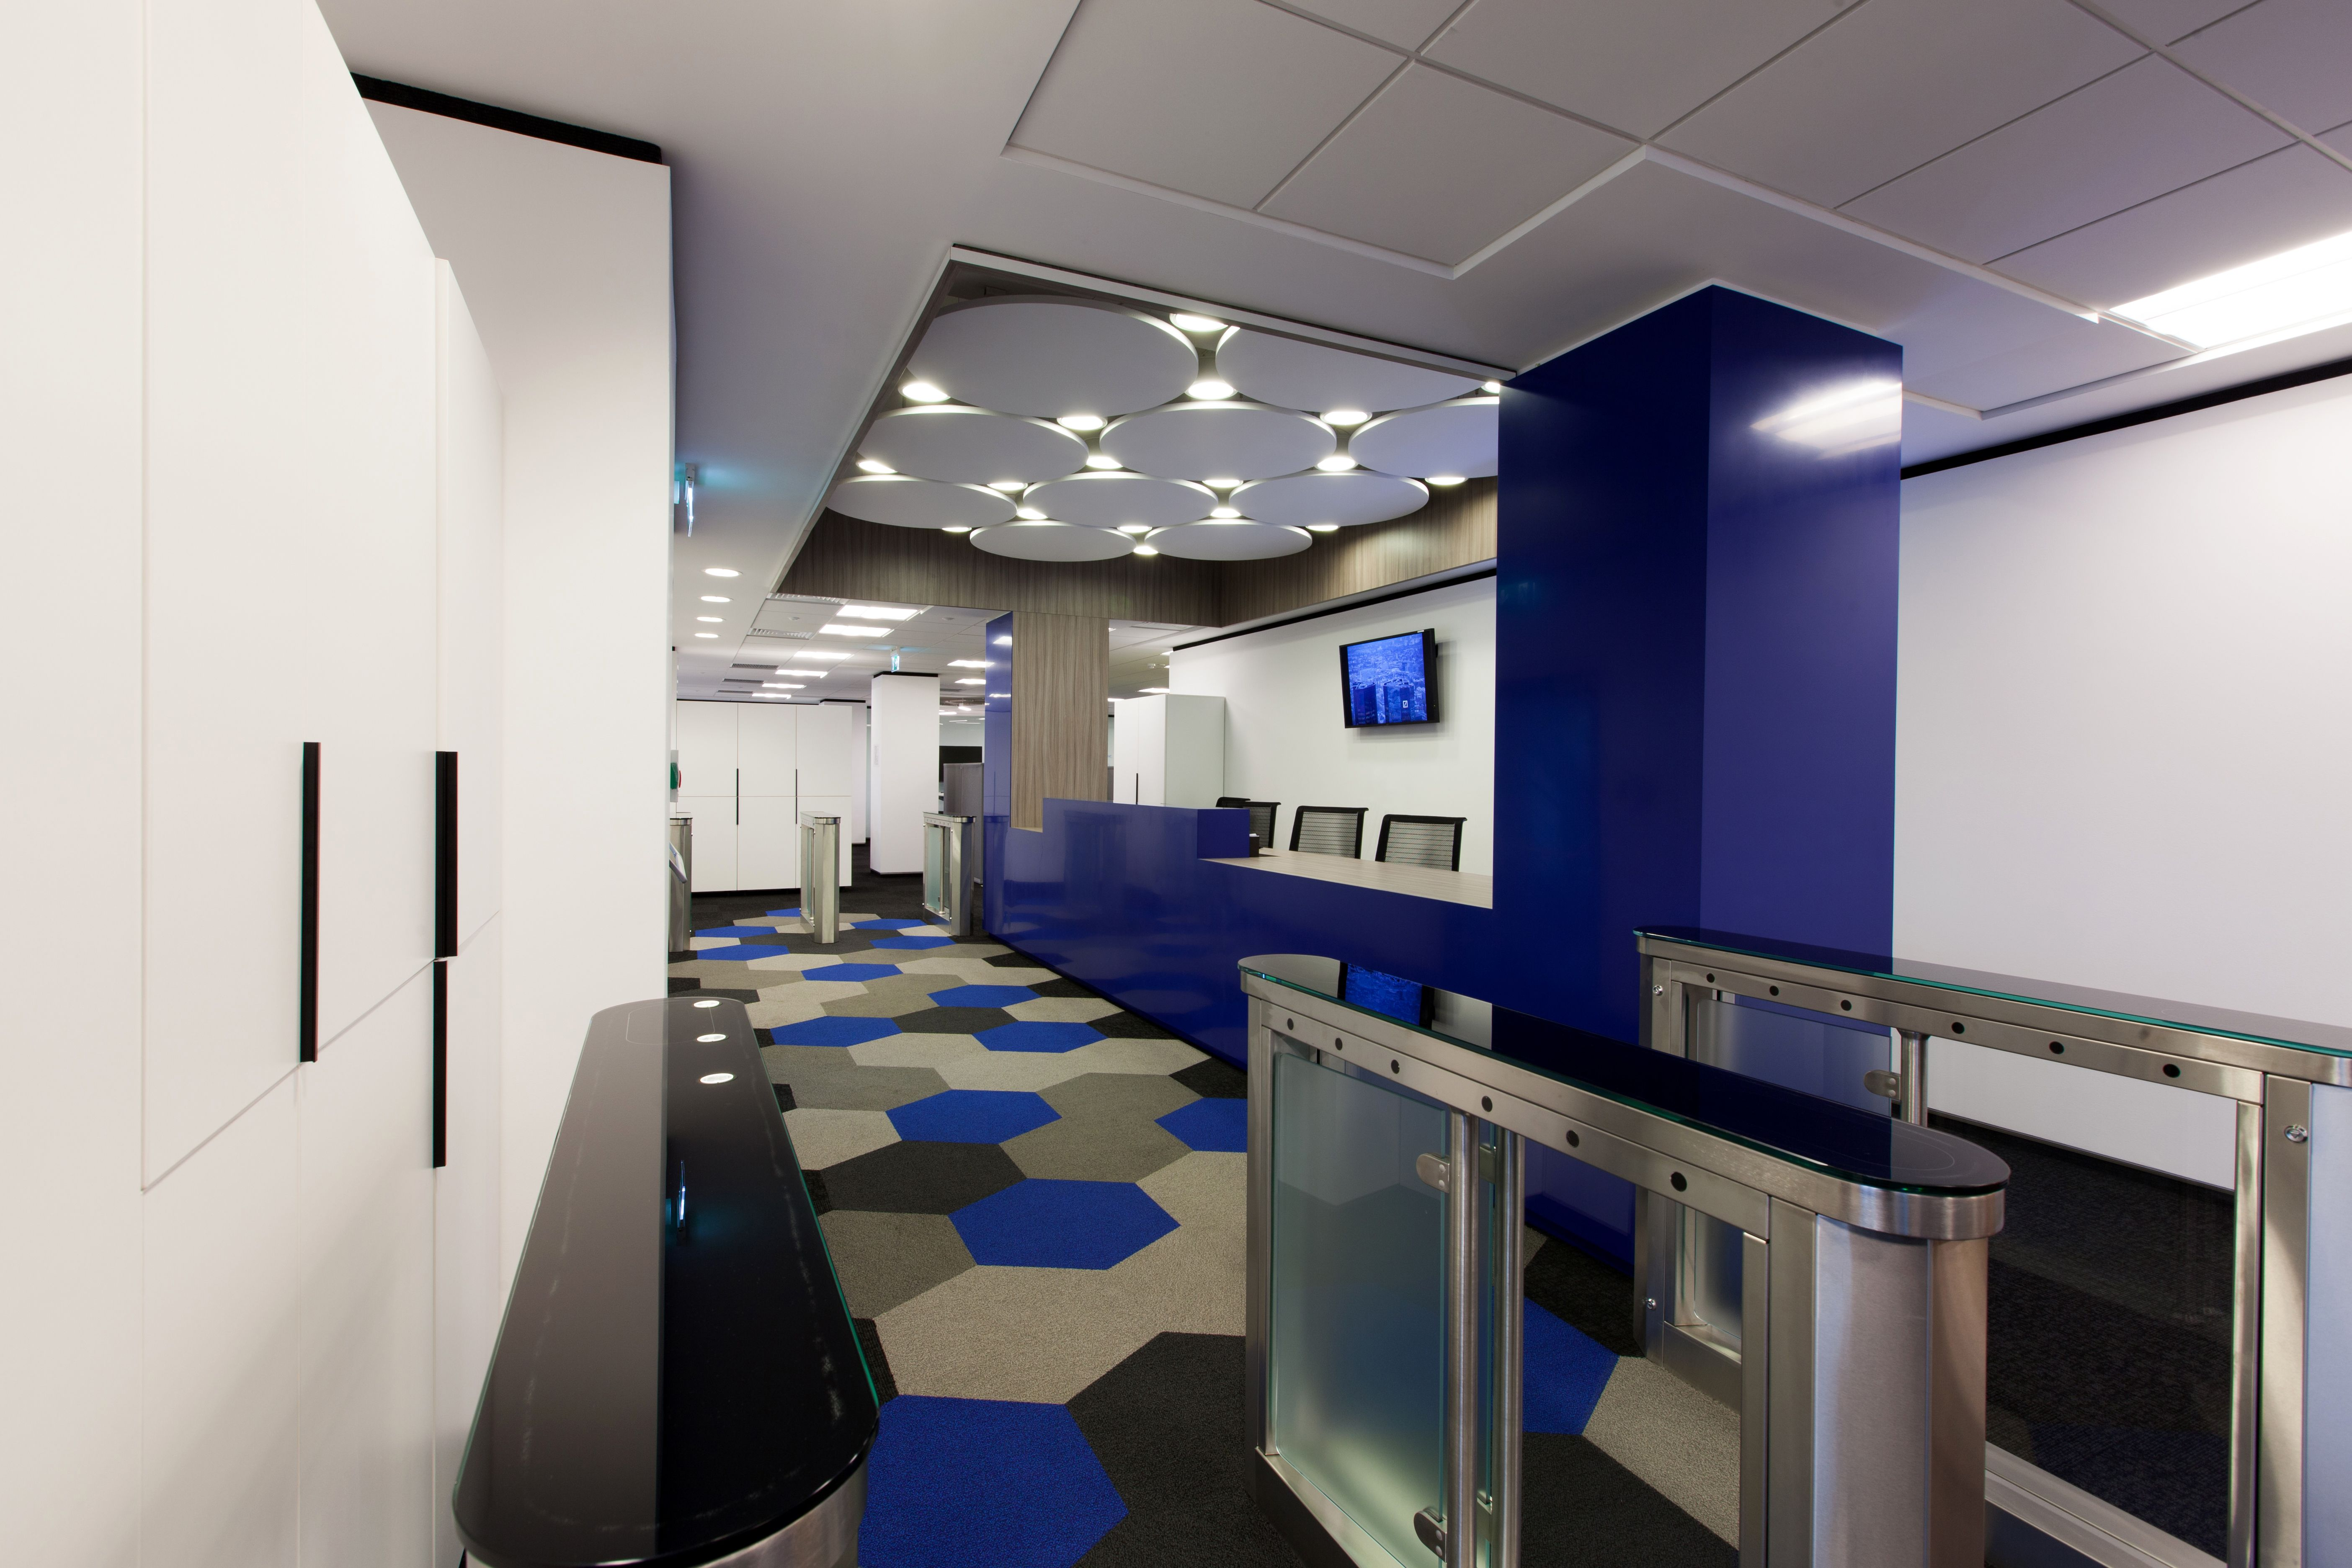 Deutsche Bank Technology Center in Cary, NC largeoffice